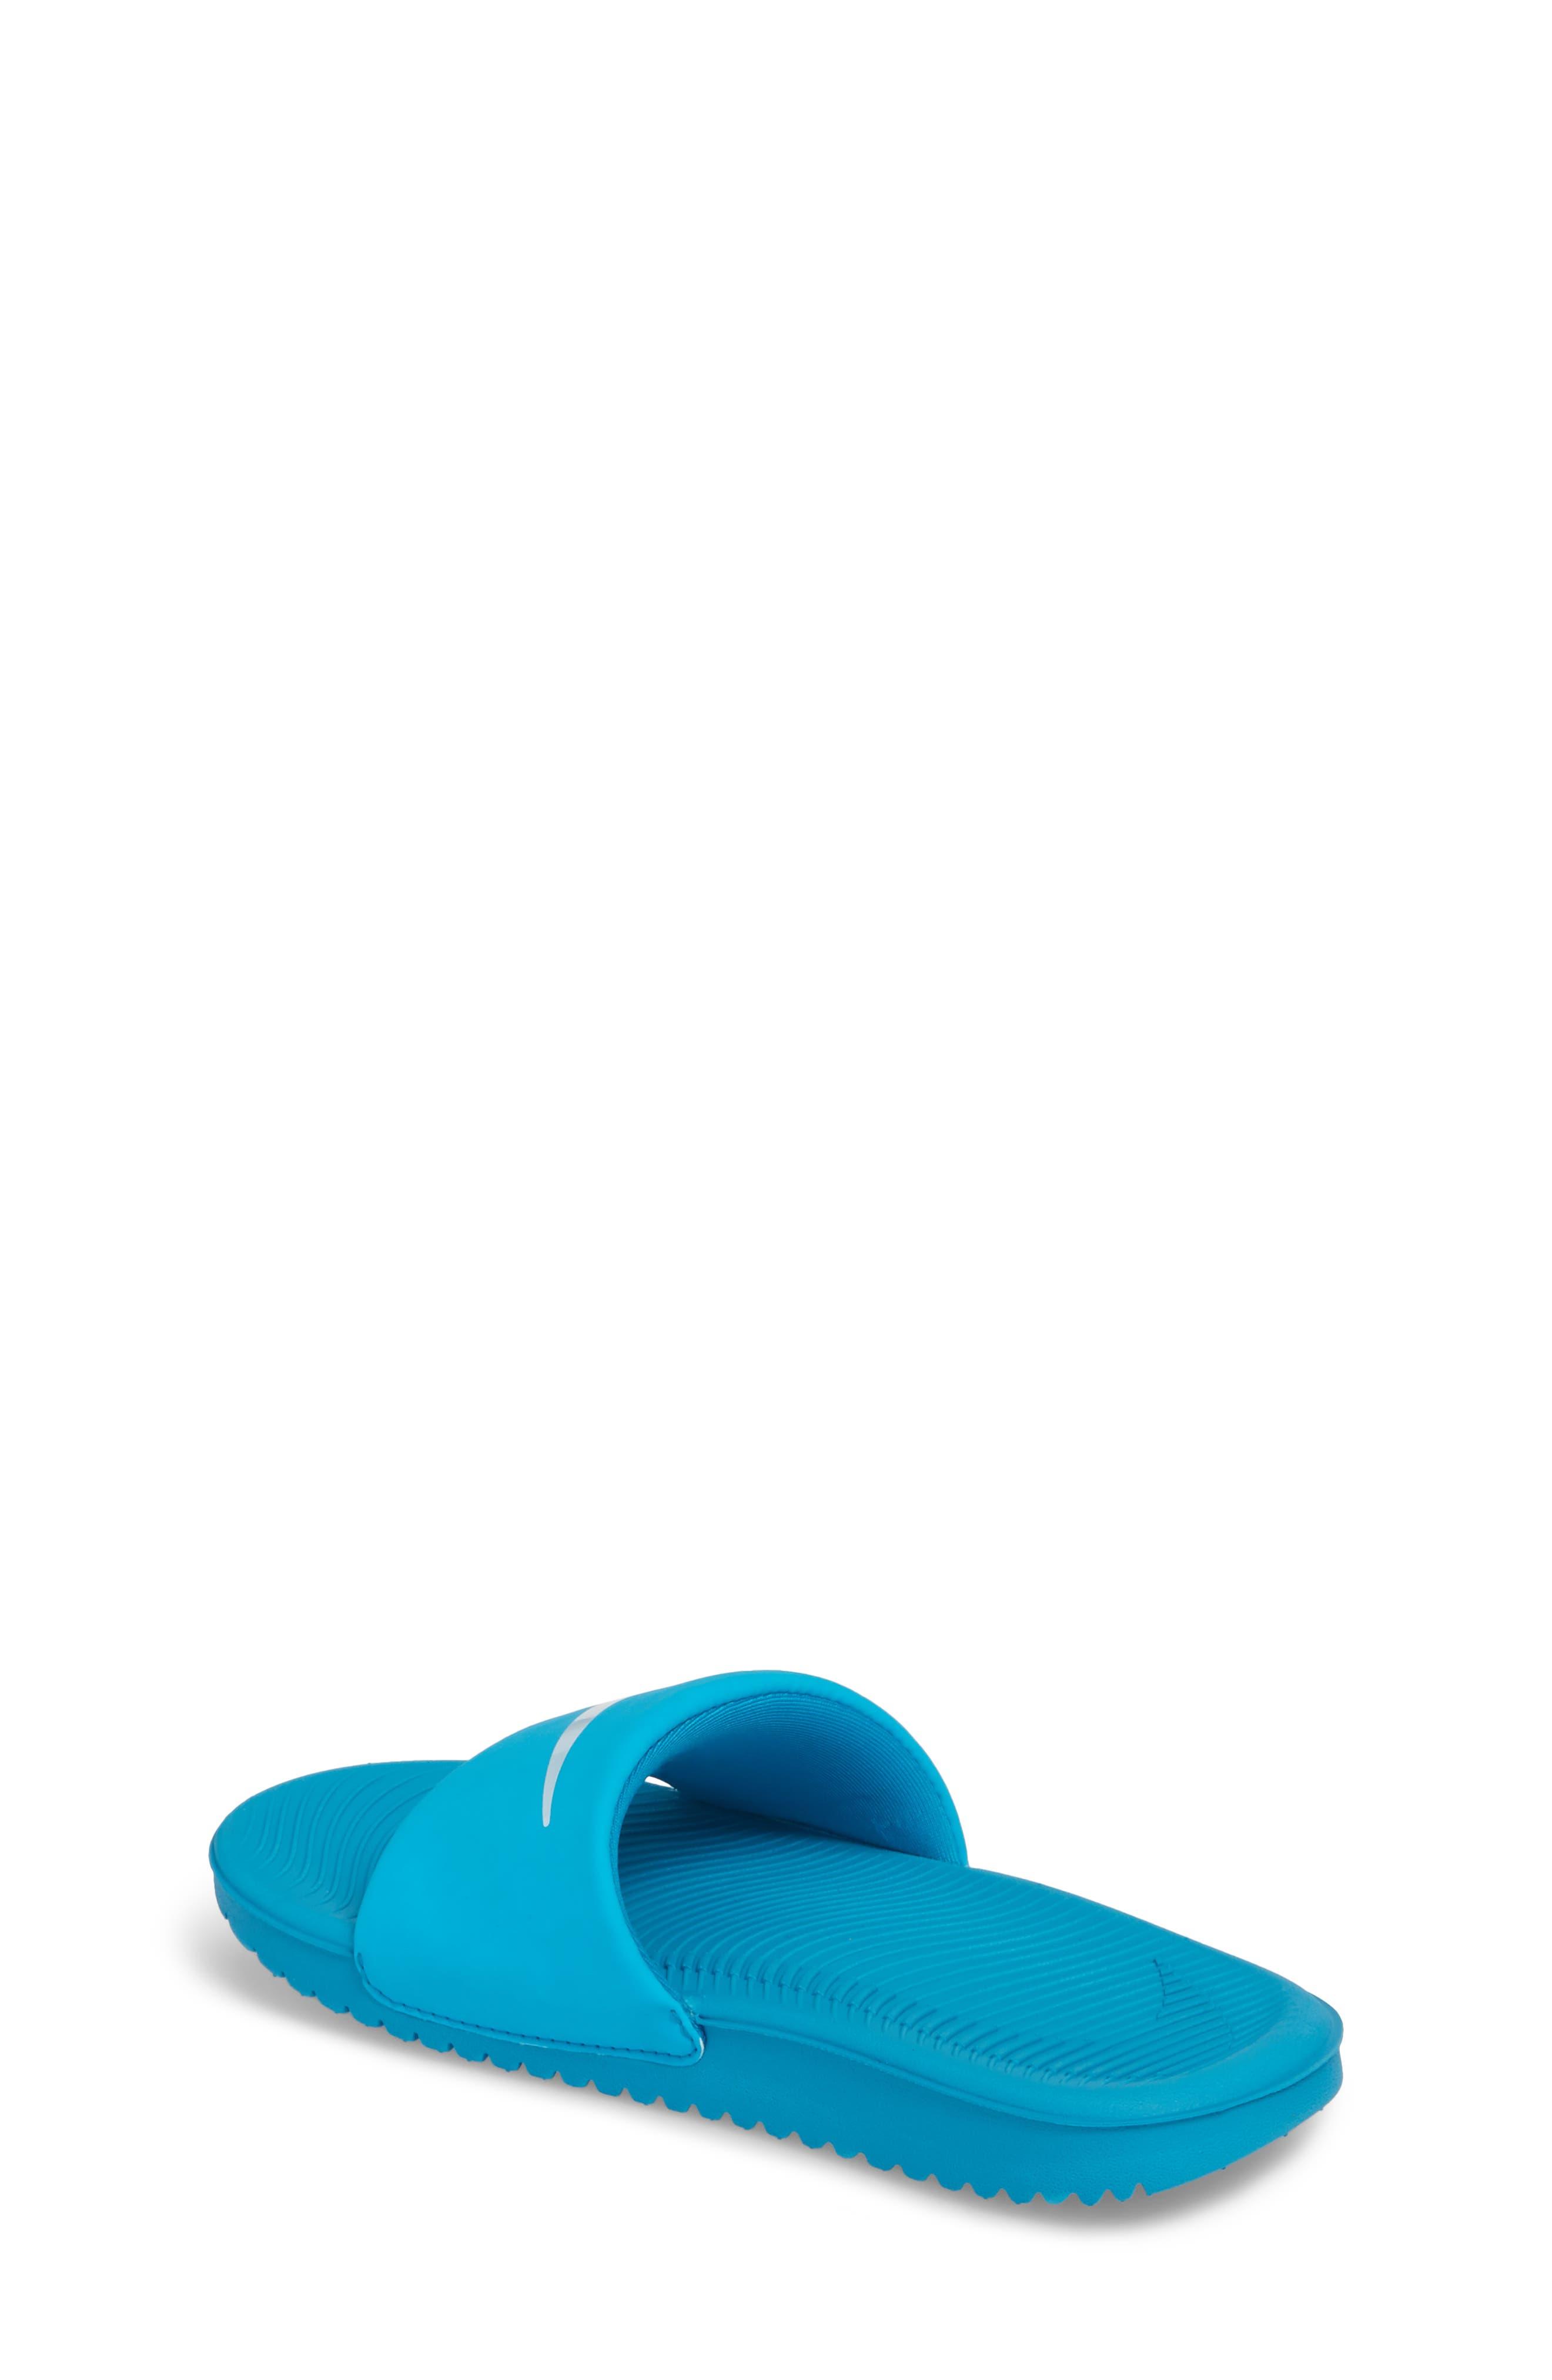 Alternate Image 2  - Nike 'Kawa' Slide Sandal (Toddler, Little Kid & Big Kid)